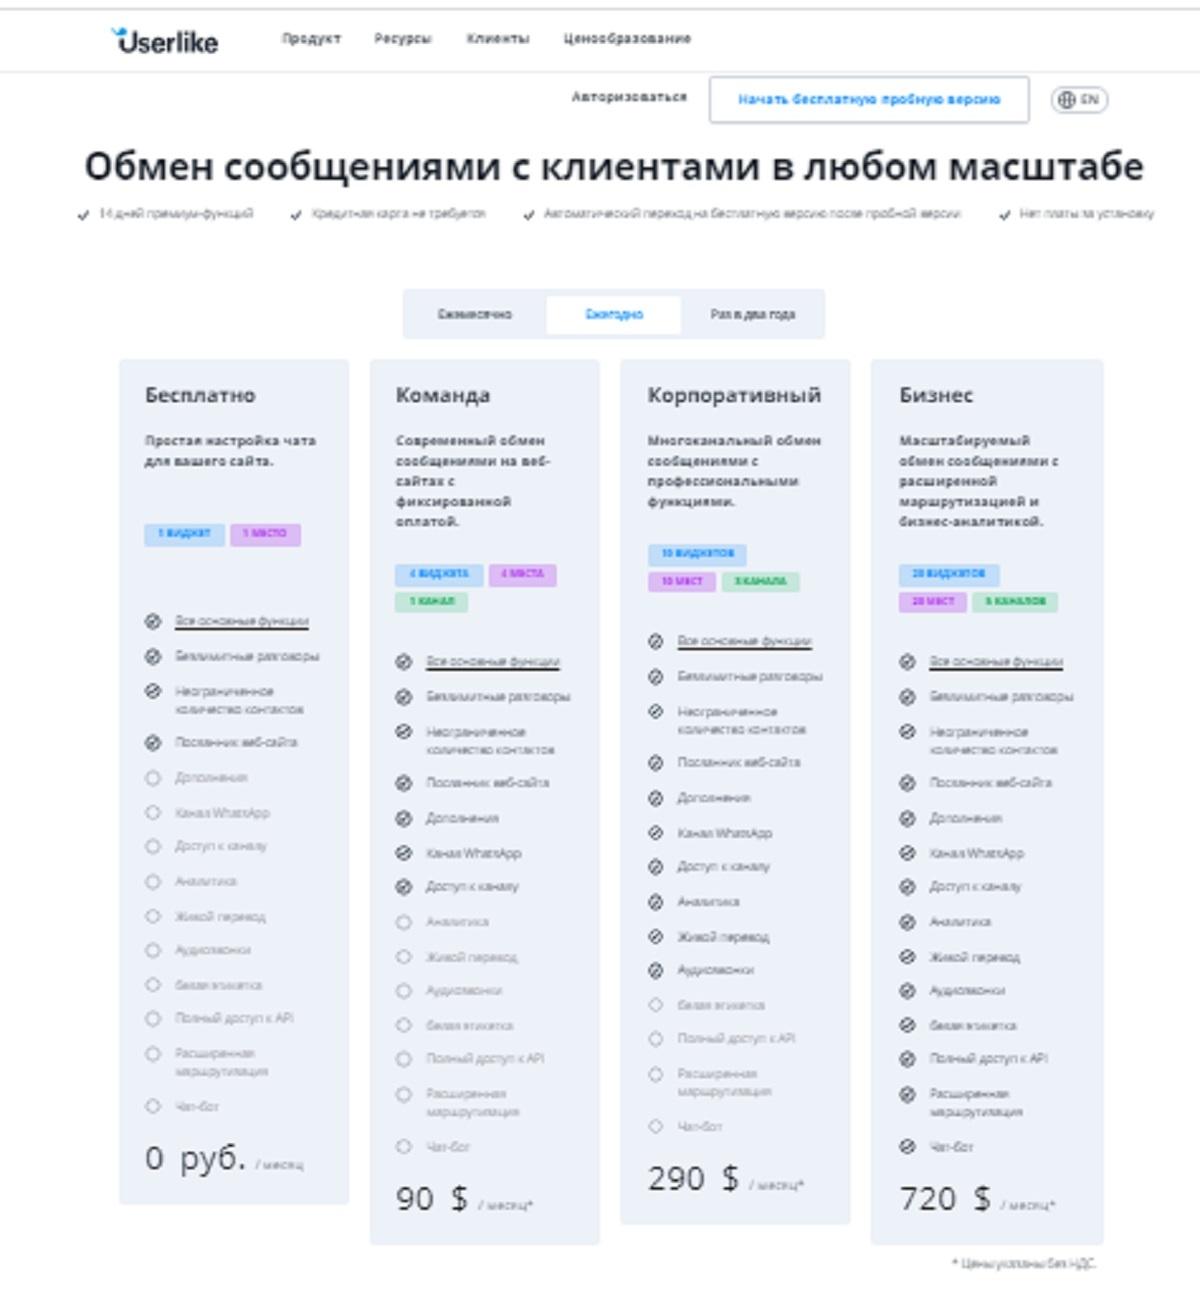 тарифы на чаты от userlike